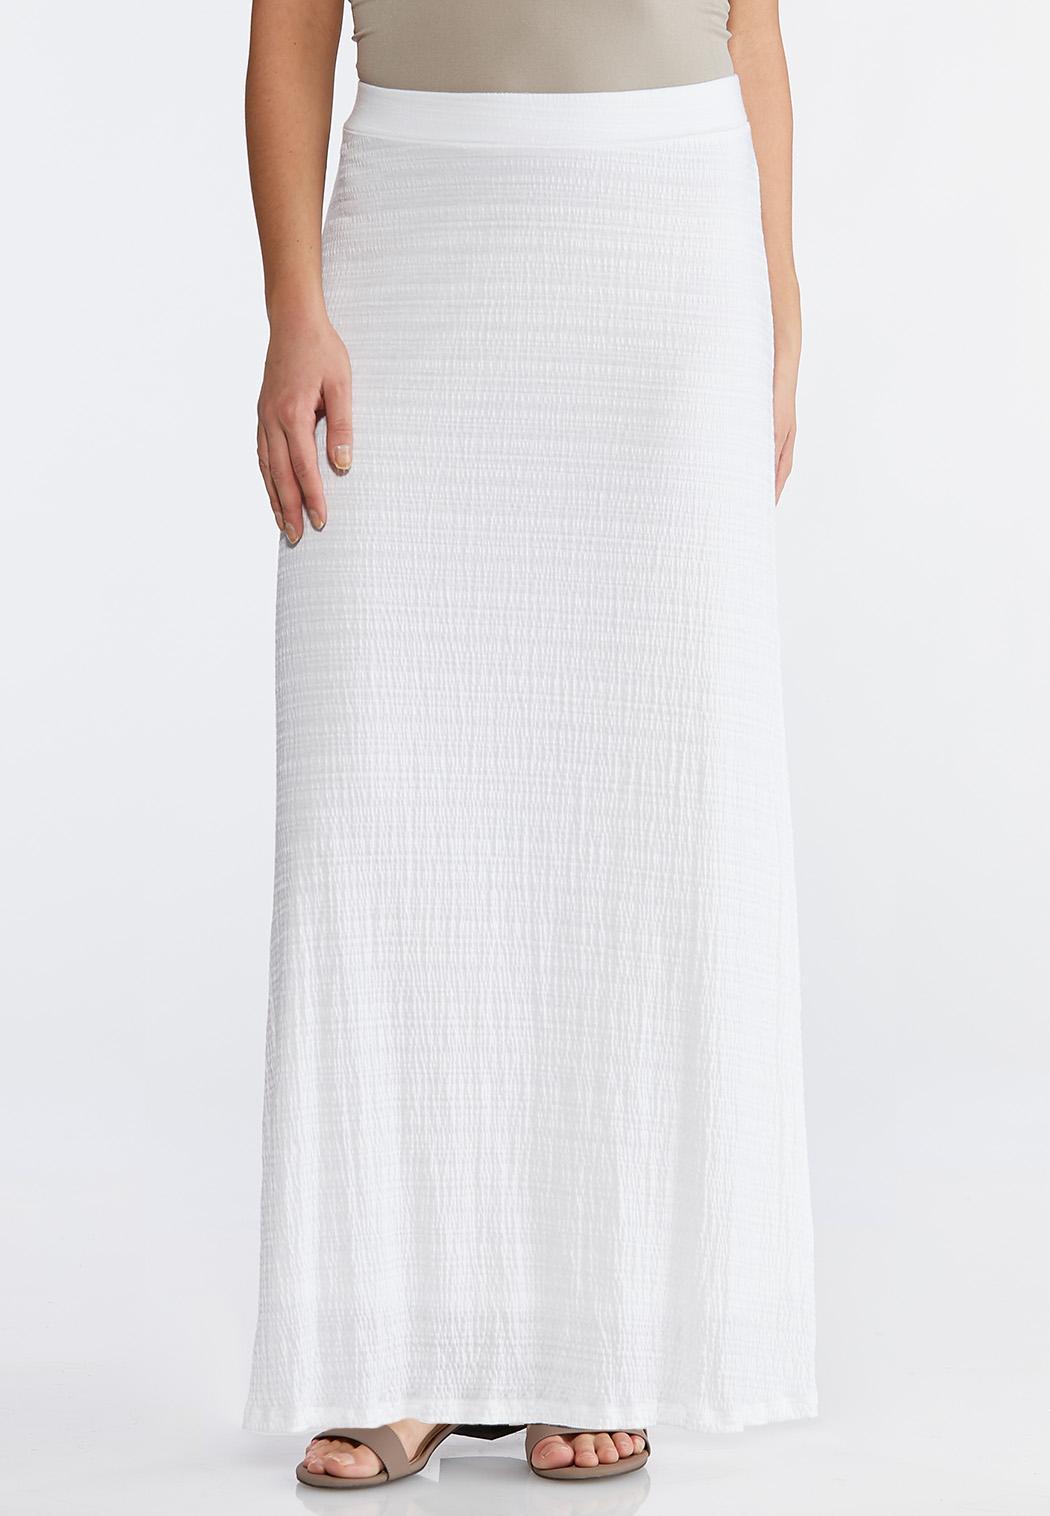 Plus Size Slub Knit Maxi Skirt